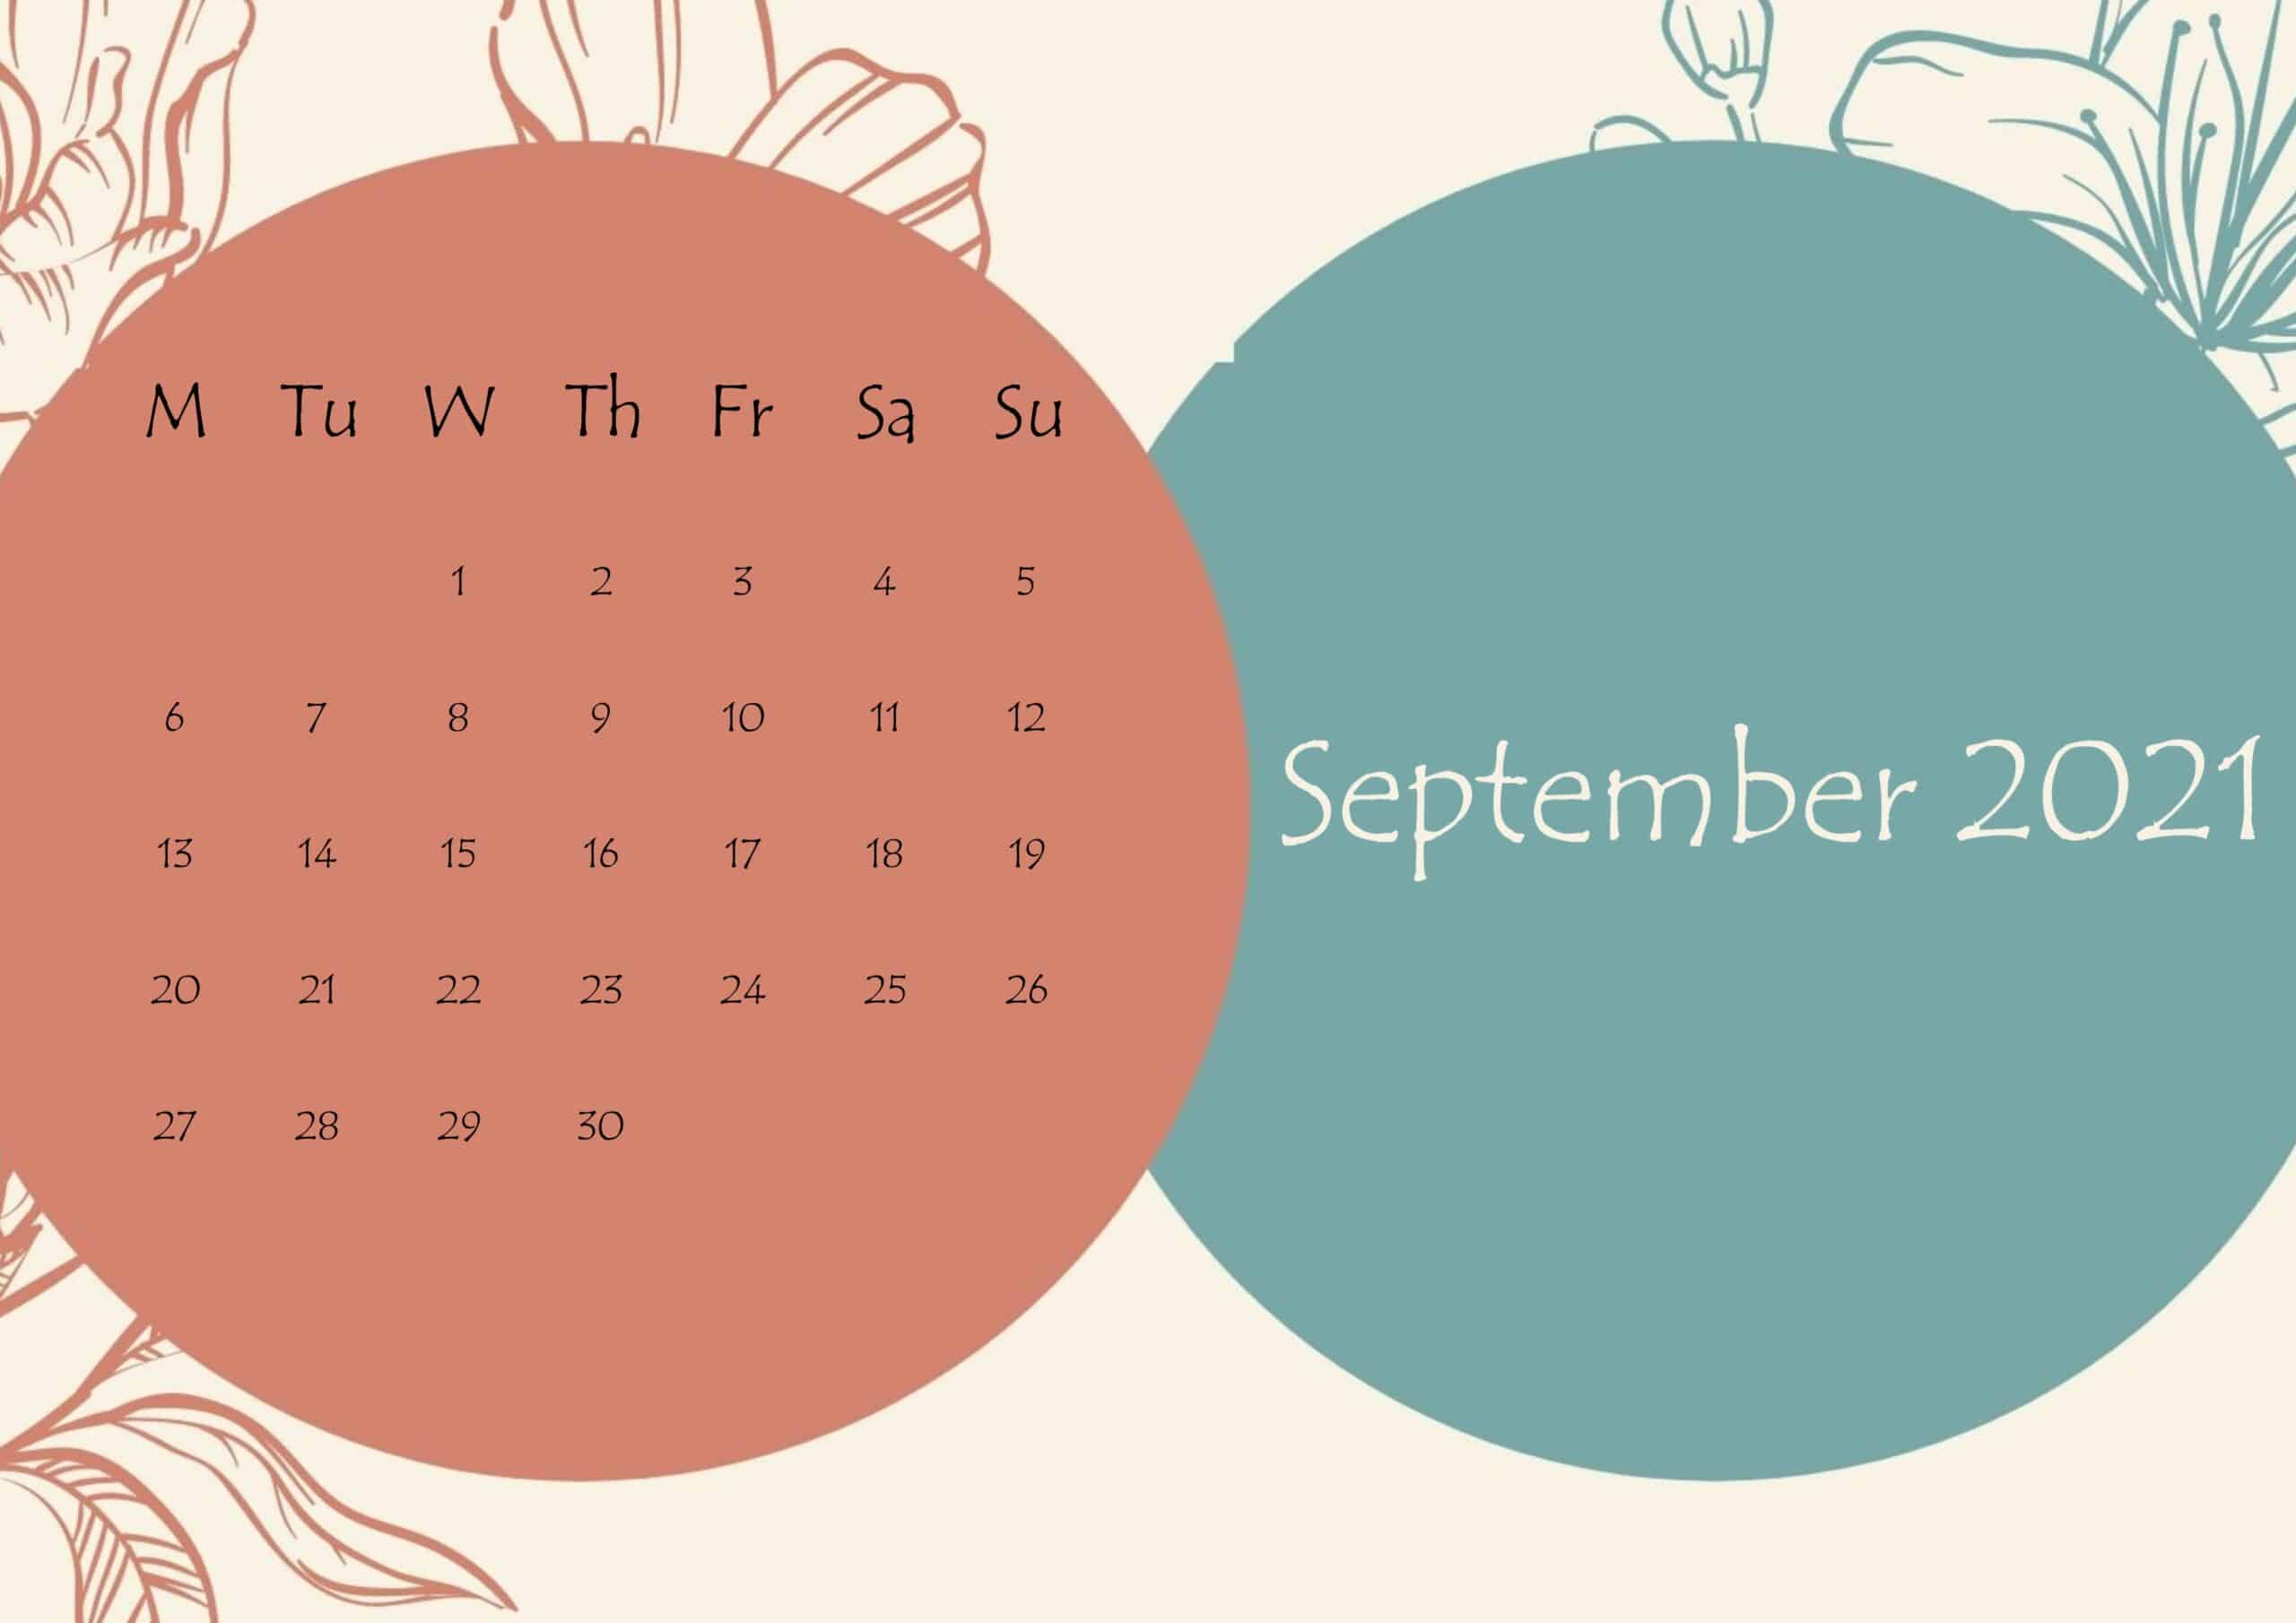 September 2021 Beautiful Floral Calendar